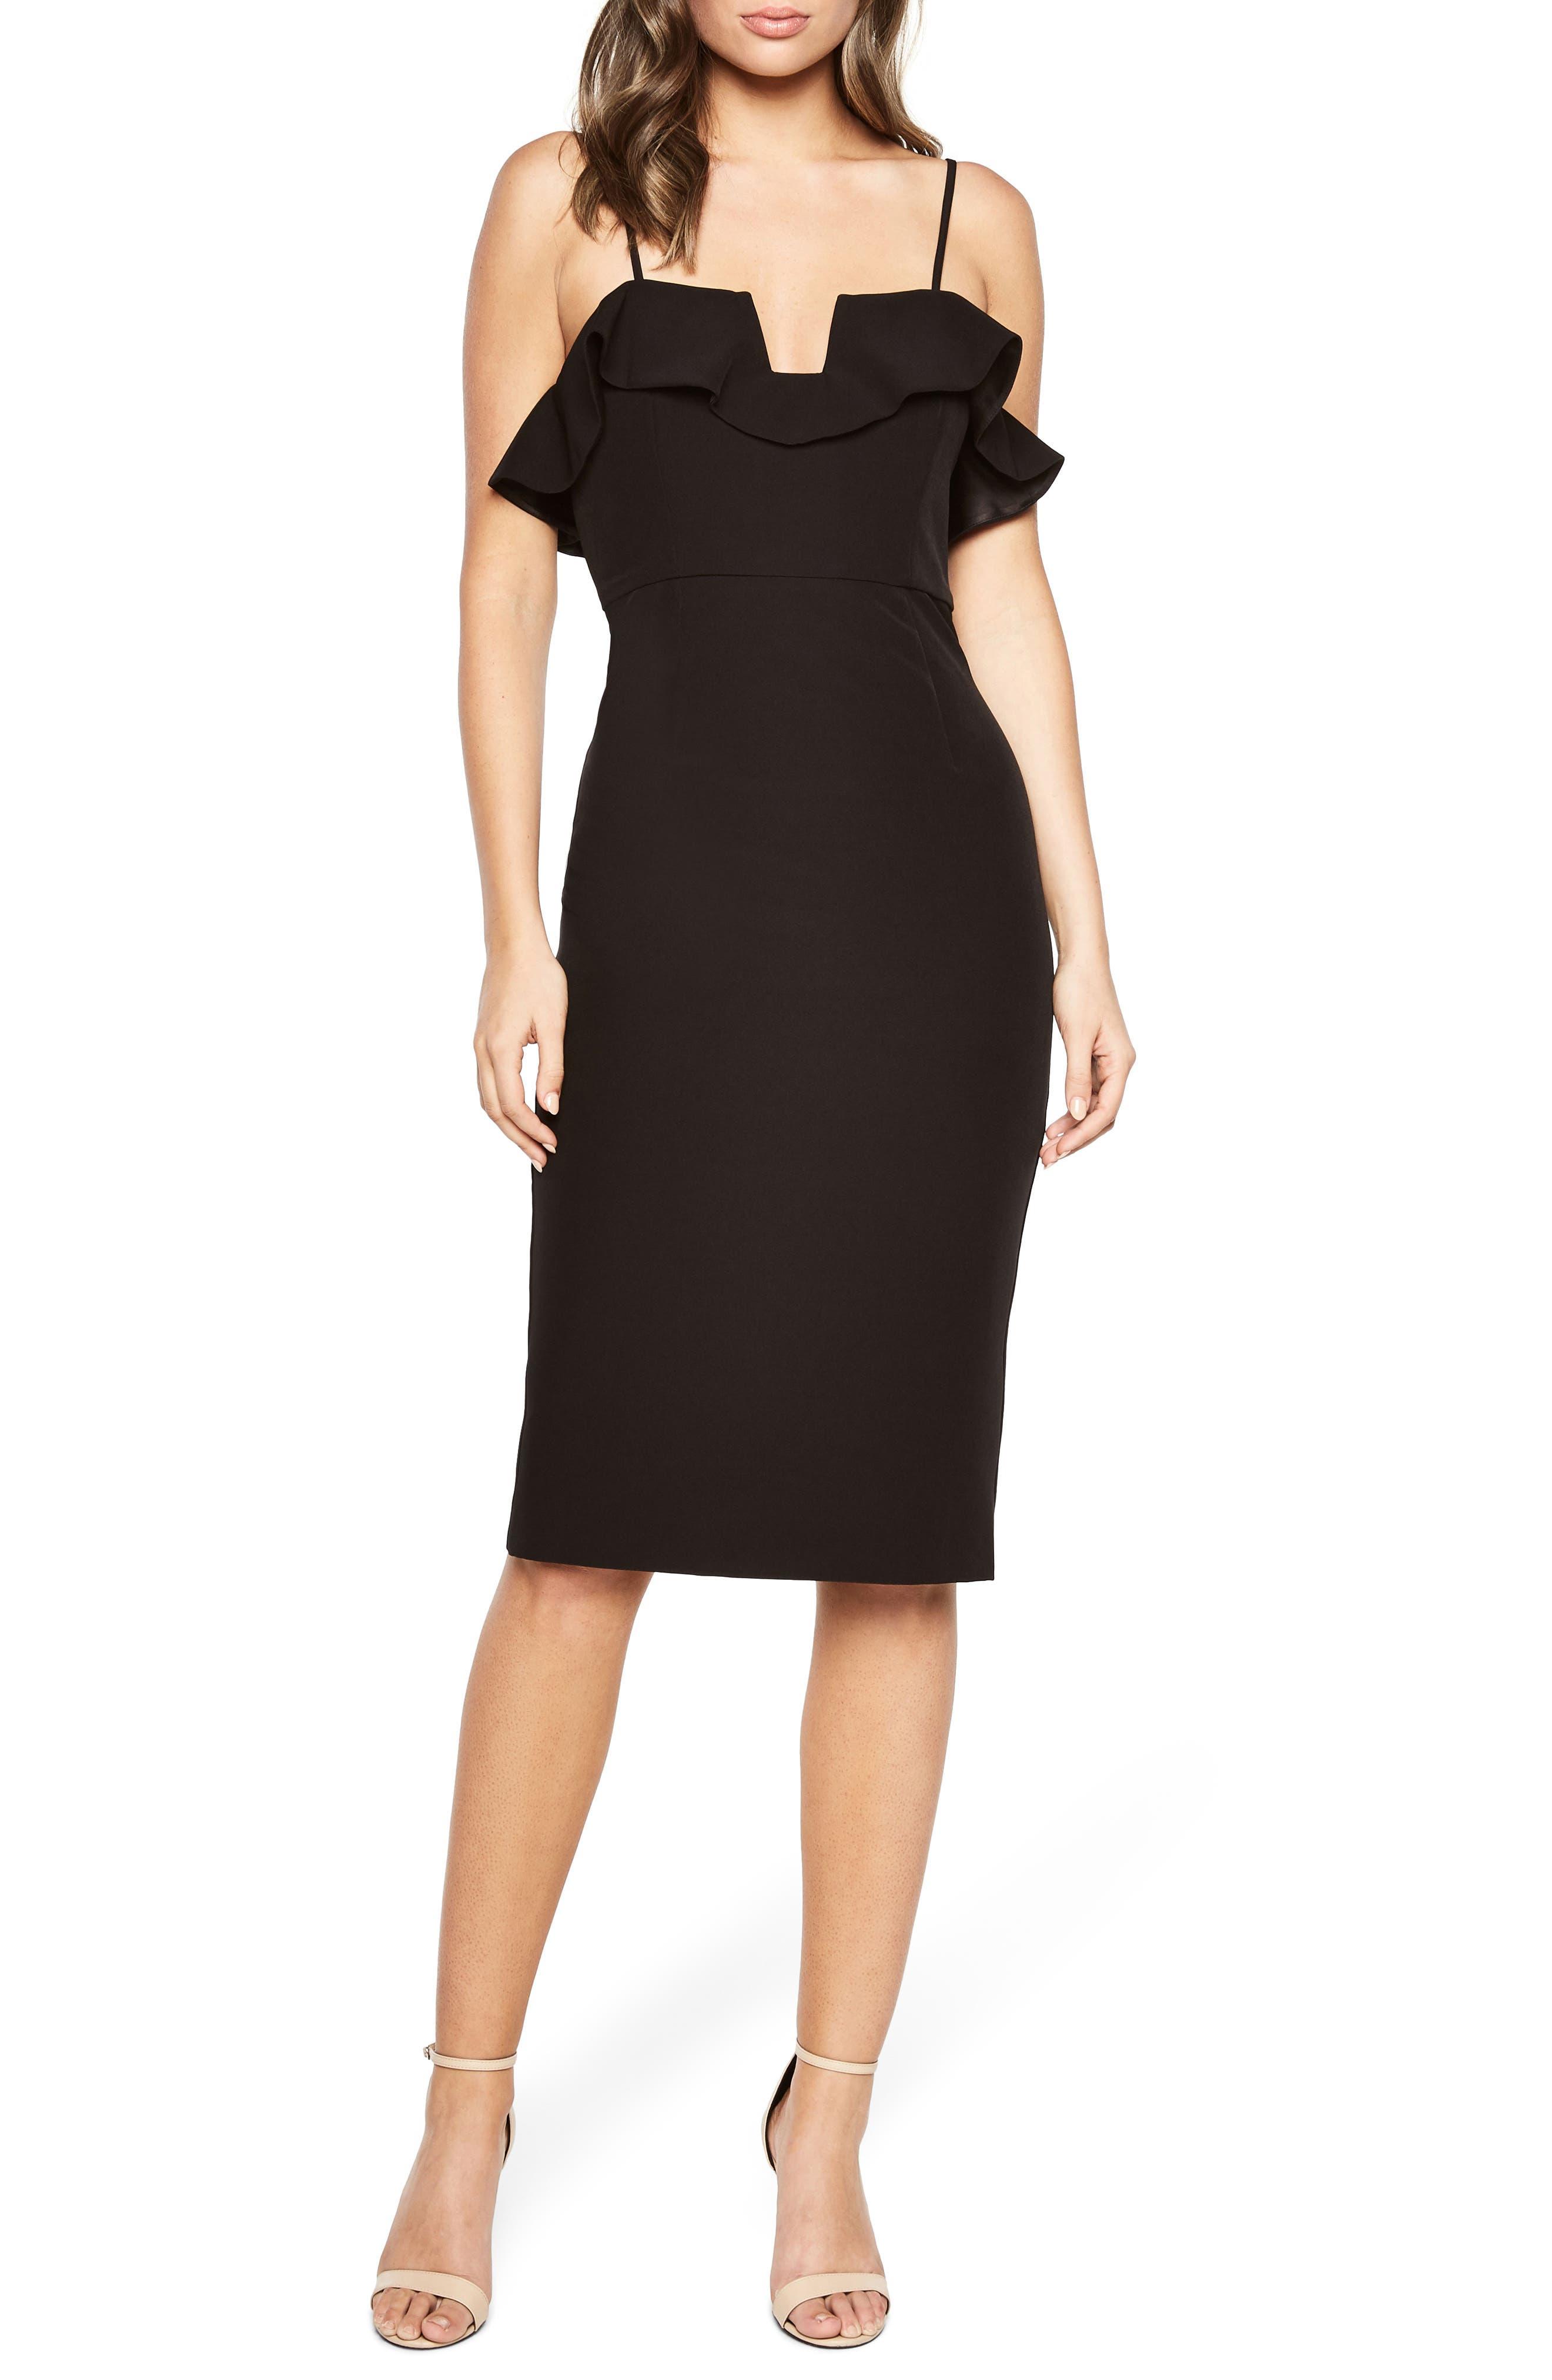 Karen Ruffled Sheath Dress,                         Main,                         color, 001